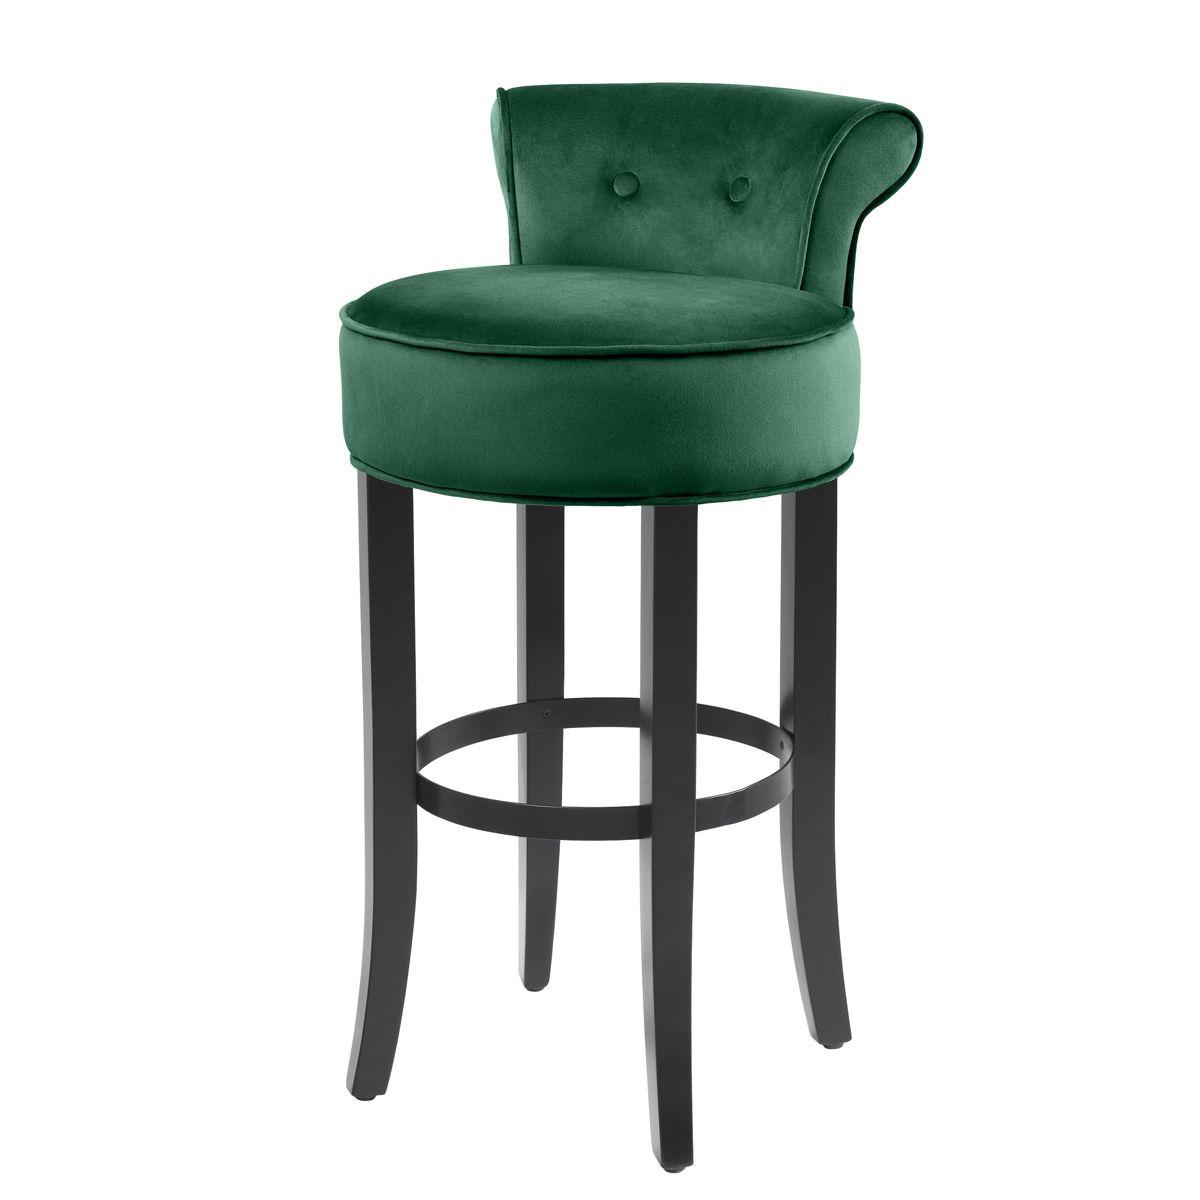 Барный стул Eichholtz Bar Stool Sophia Loren Green  - фото 1